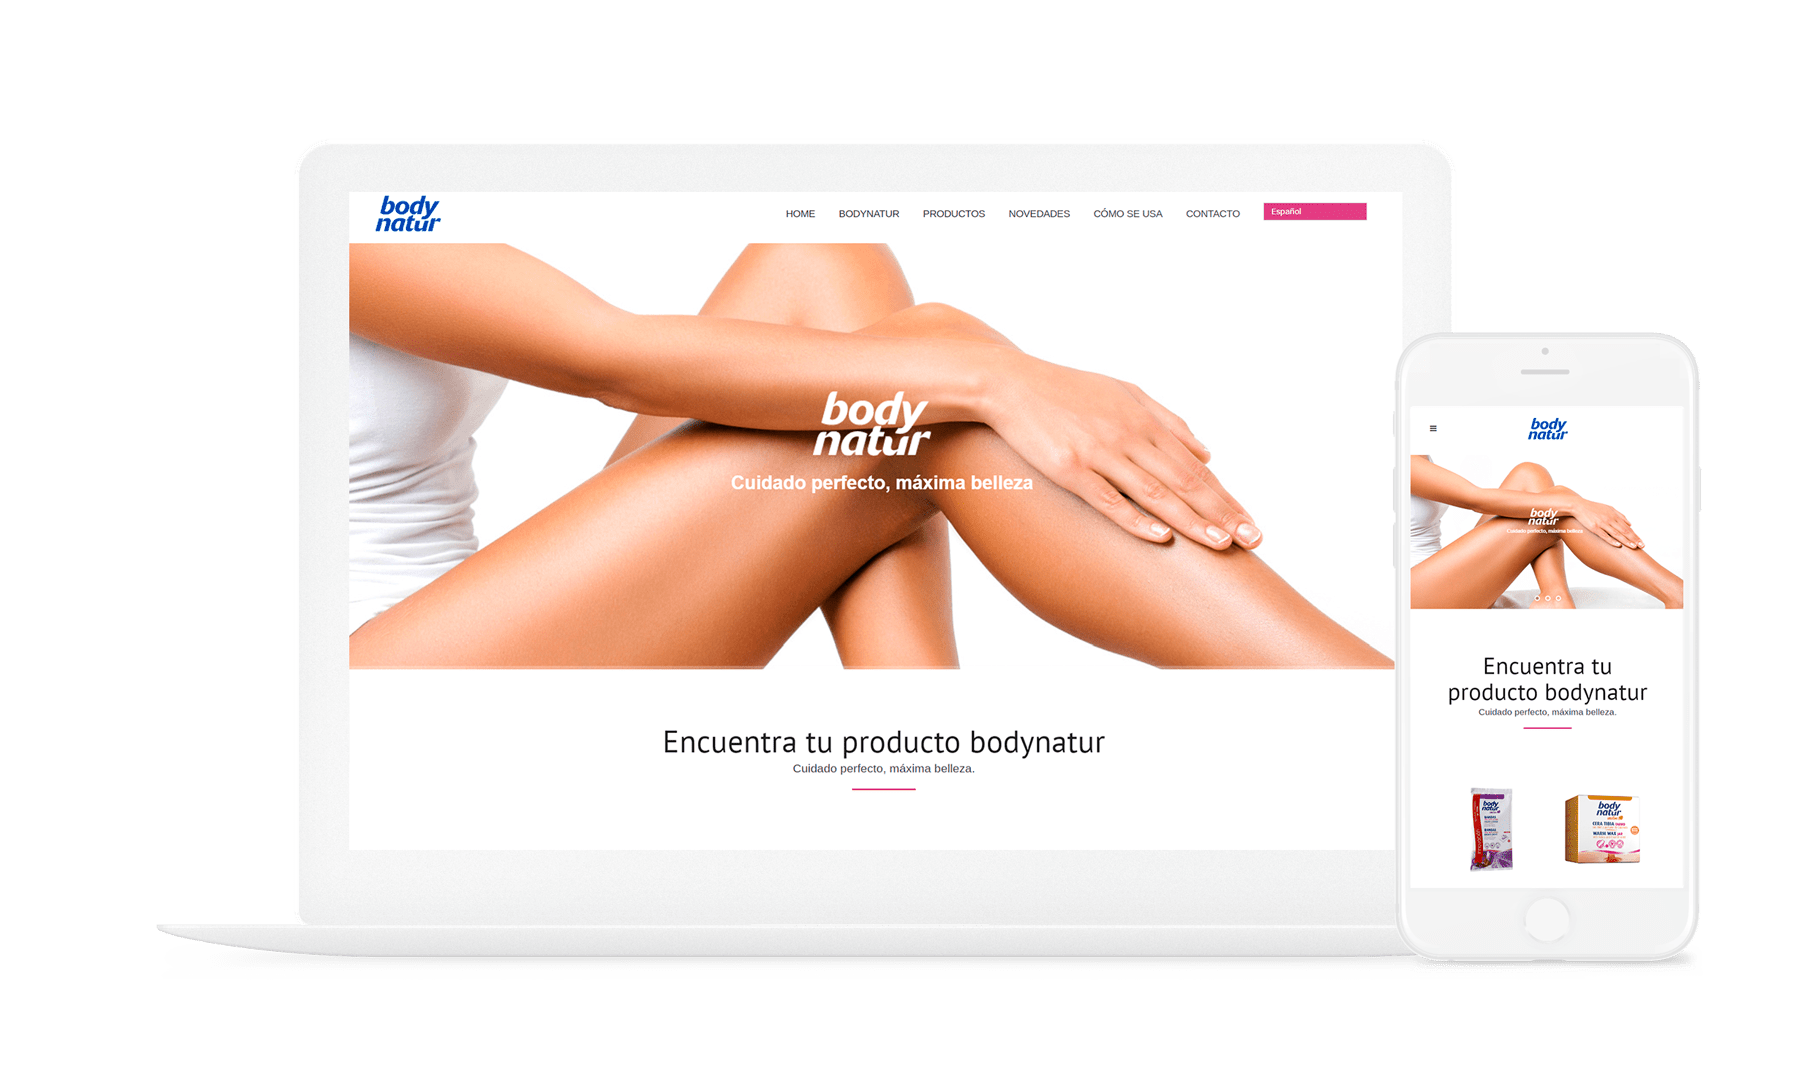 diseño online • Body Natur